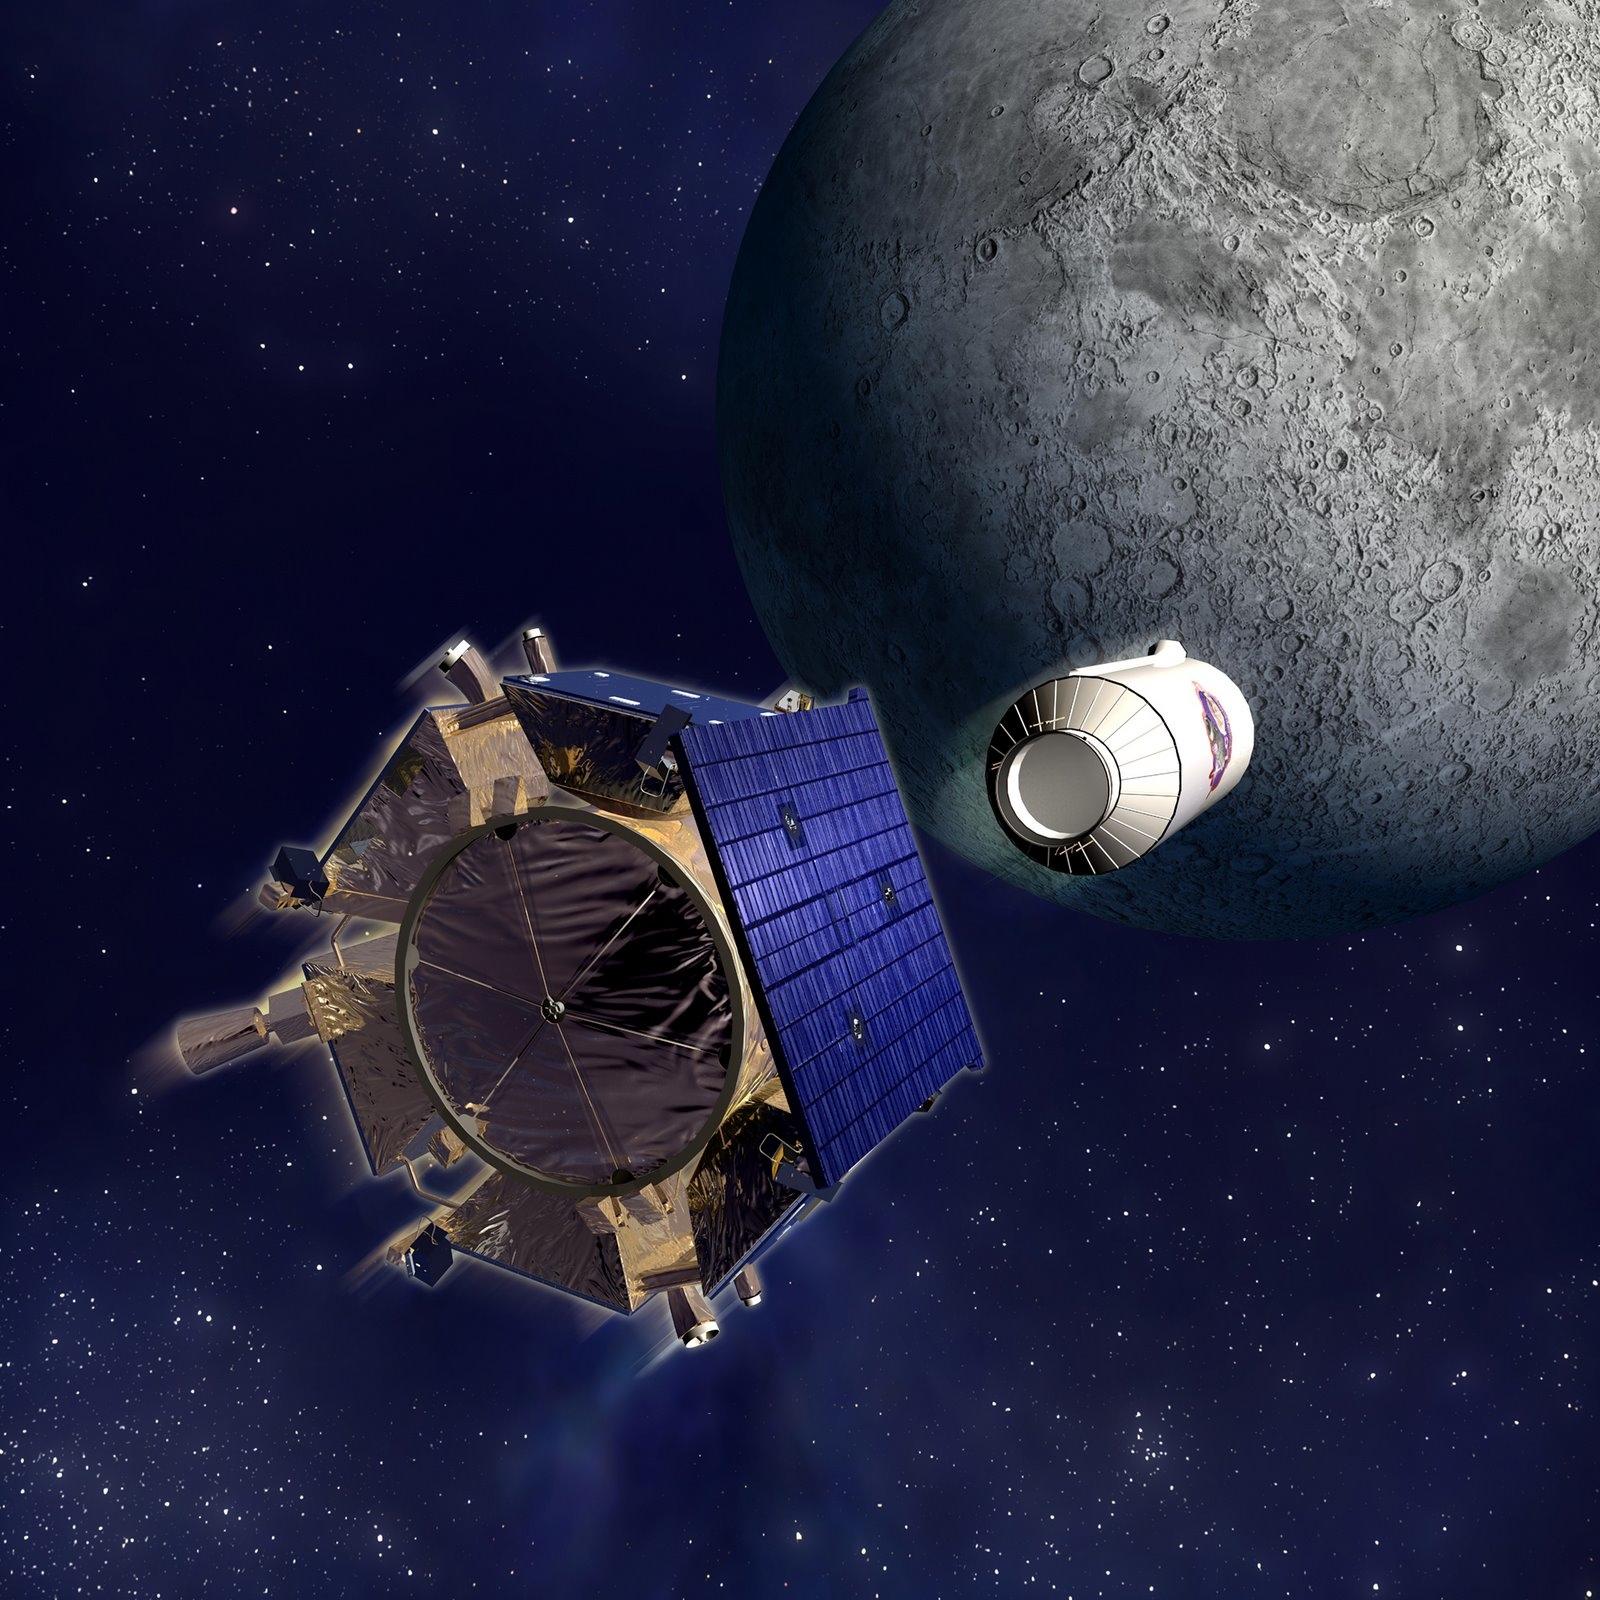 rocket landing on moon - photo #15